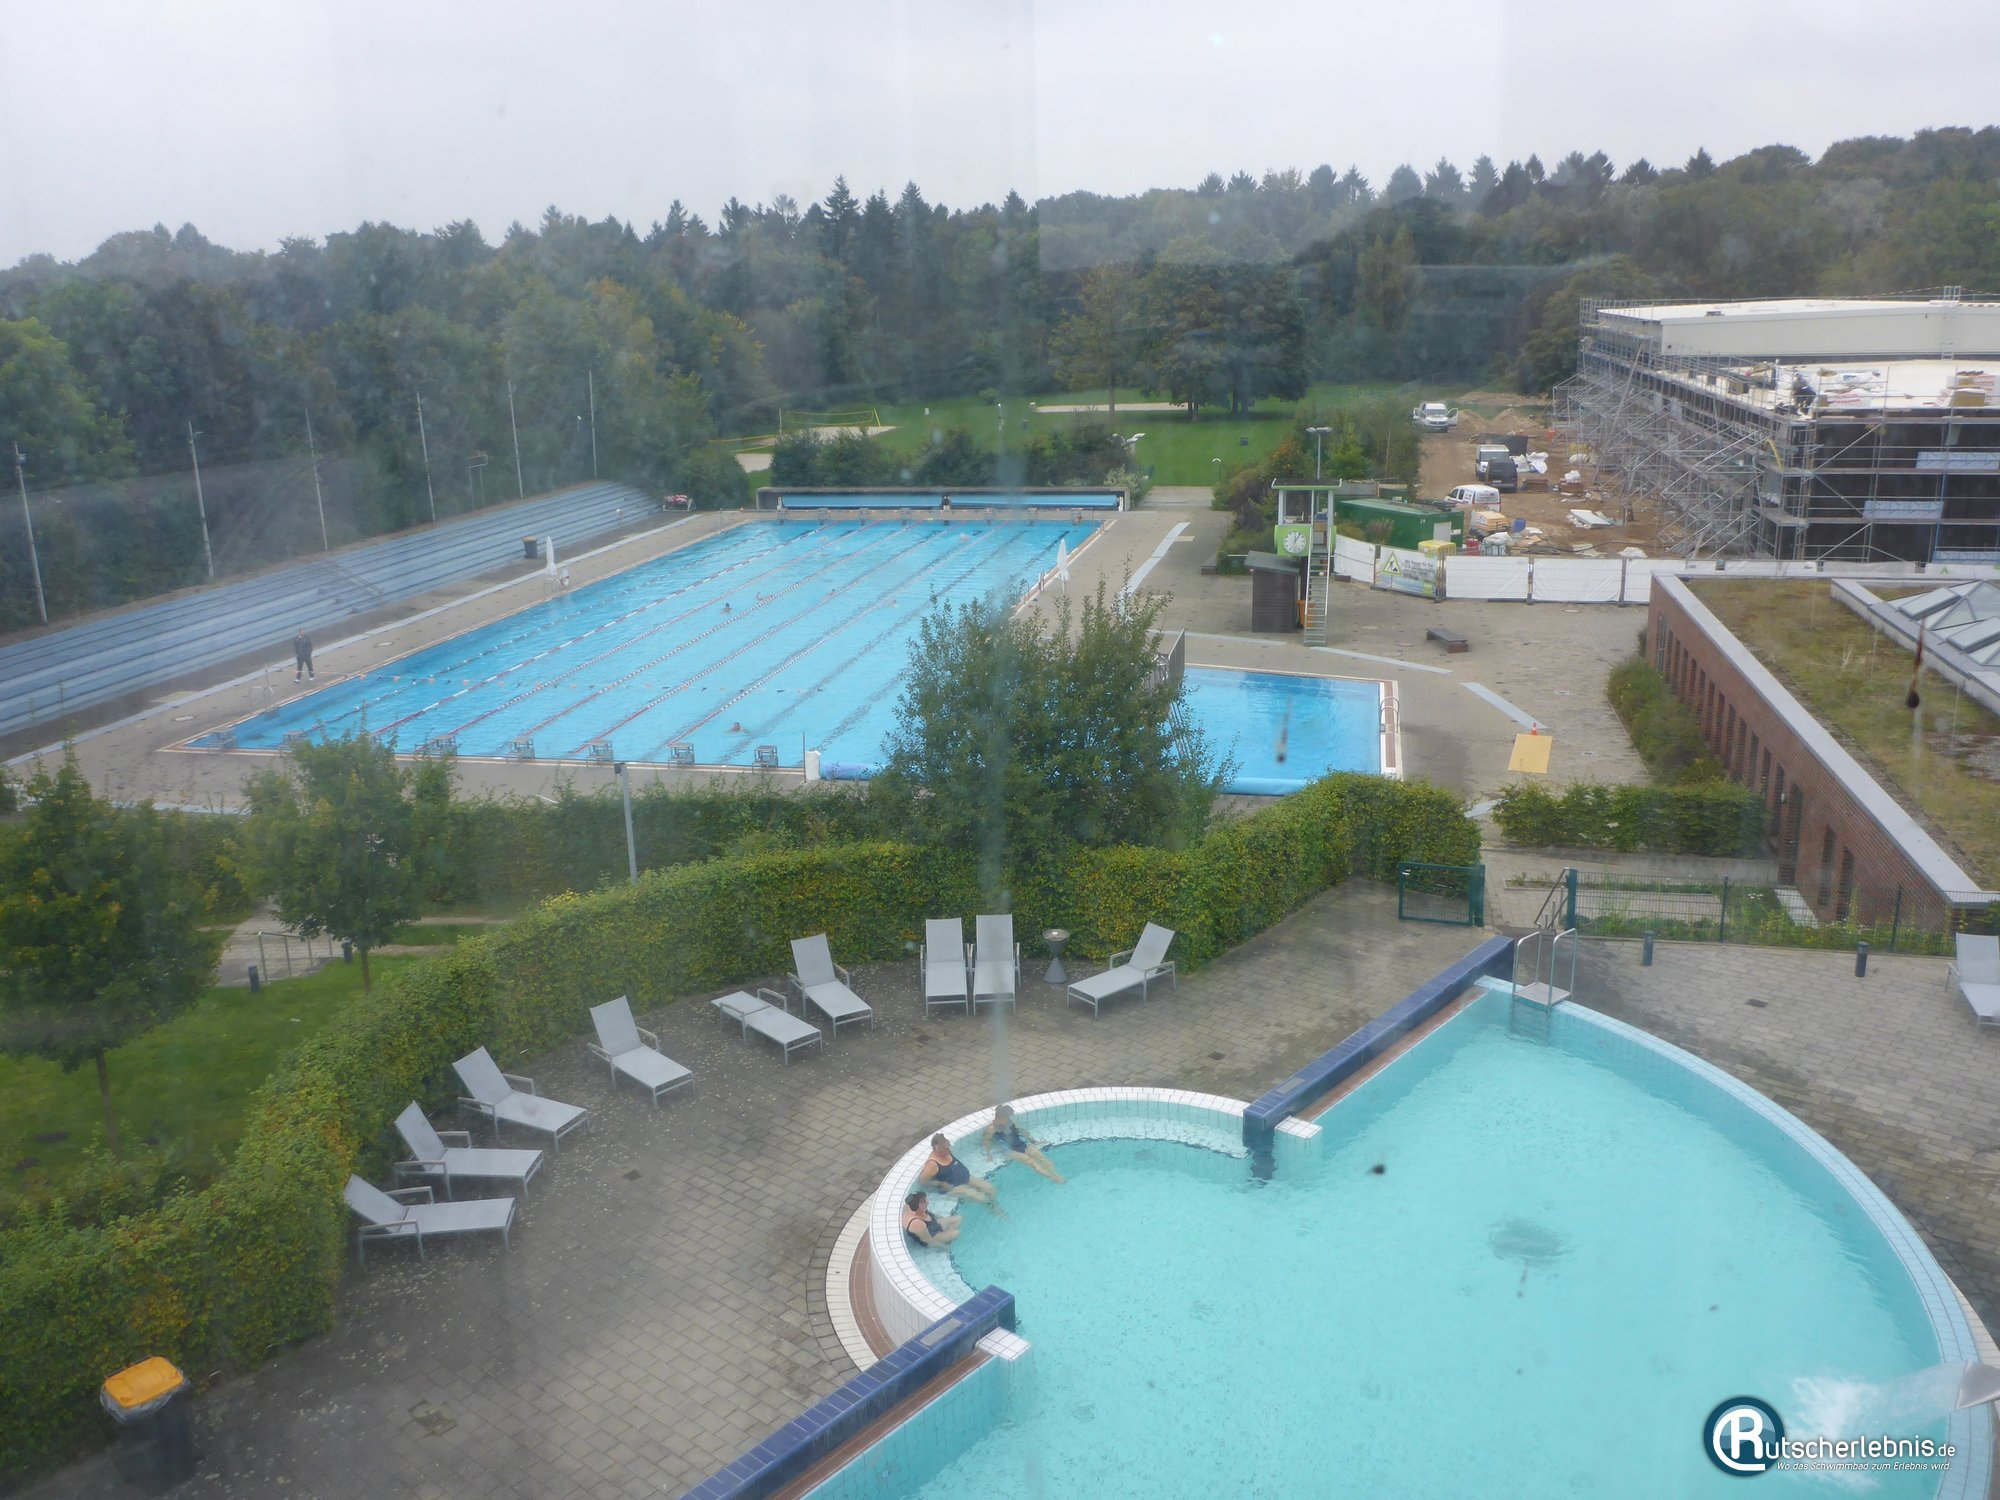 Schwimmbad Neumünster bad am stadtwald neumünster rutscherlebnis de